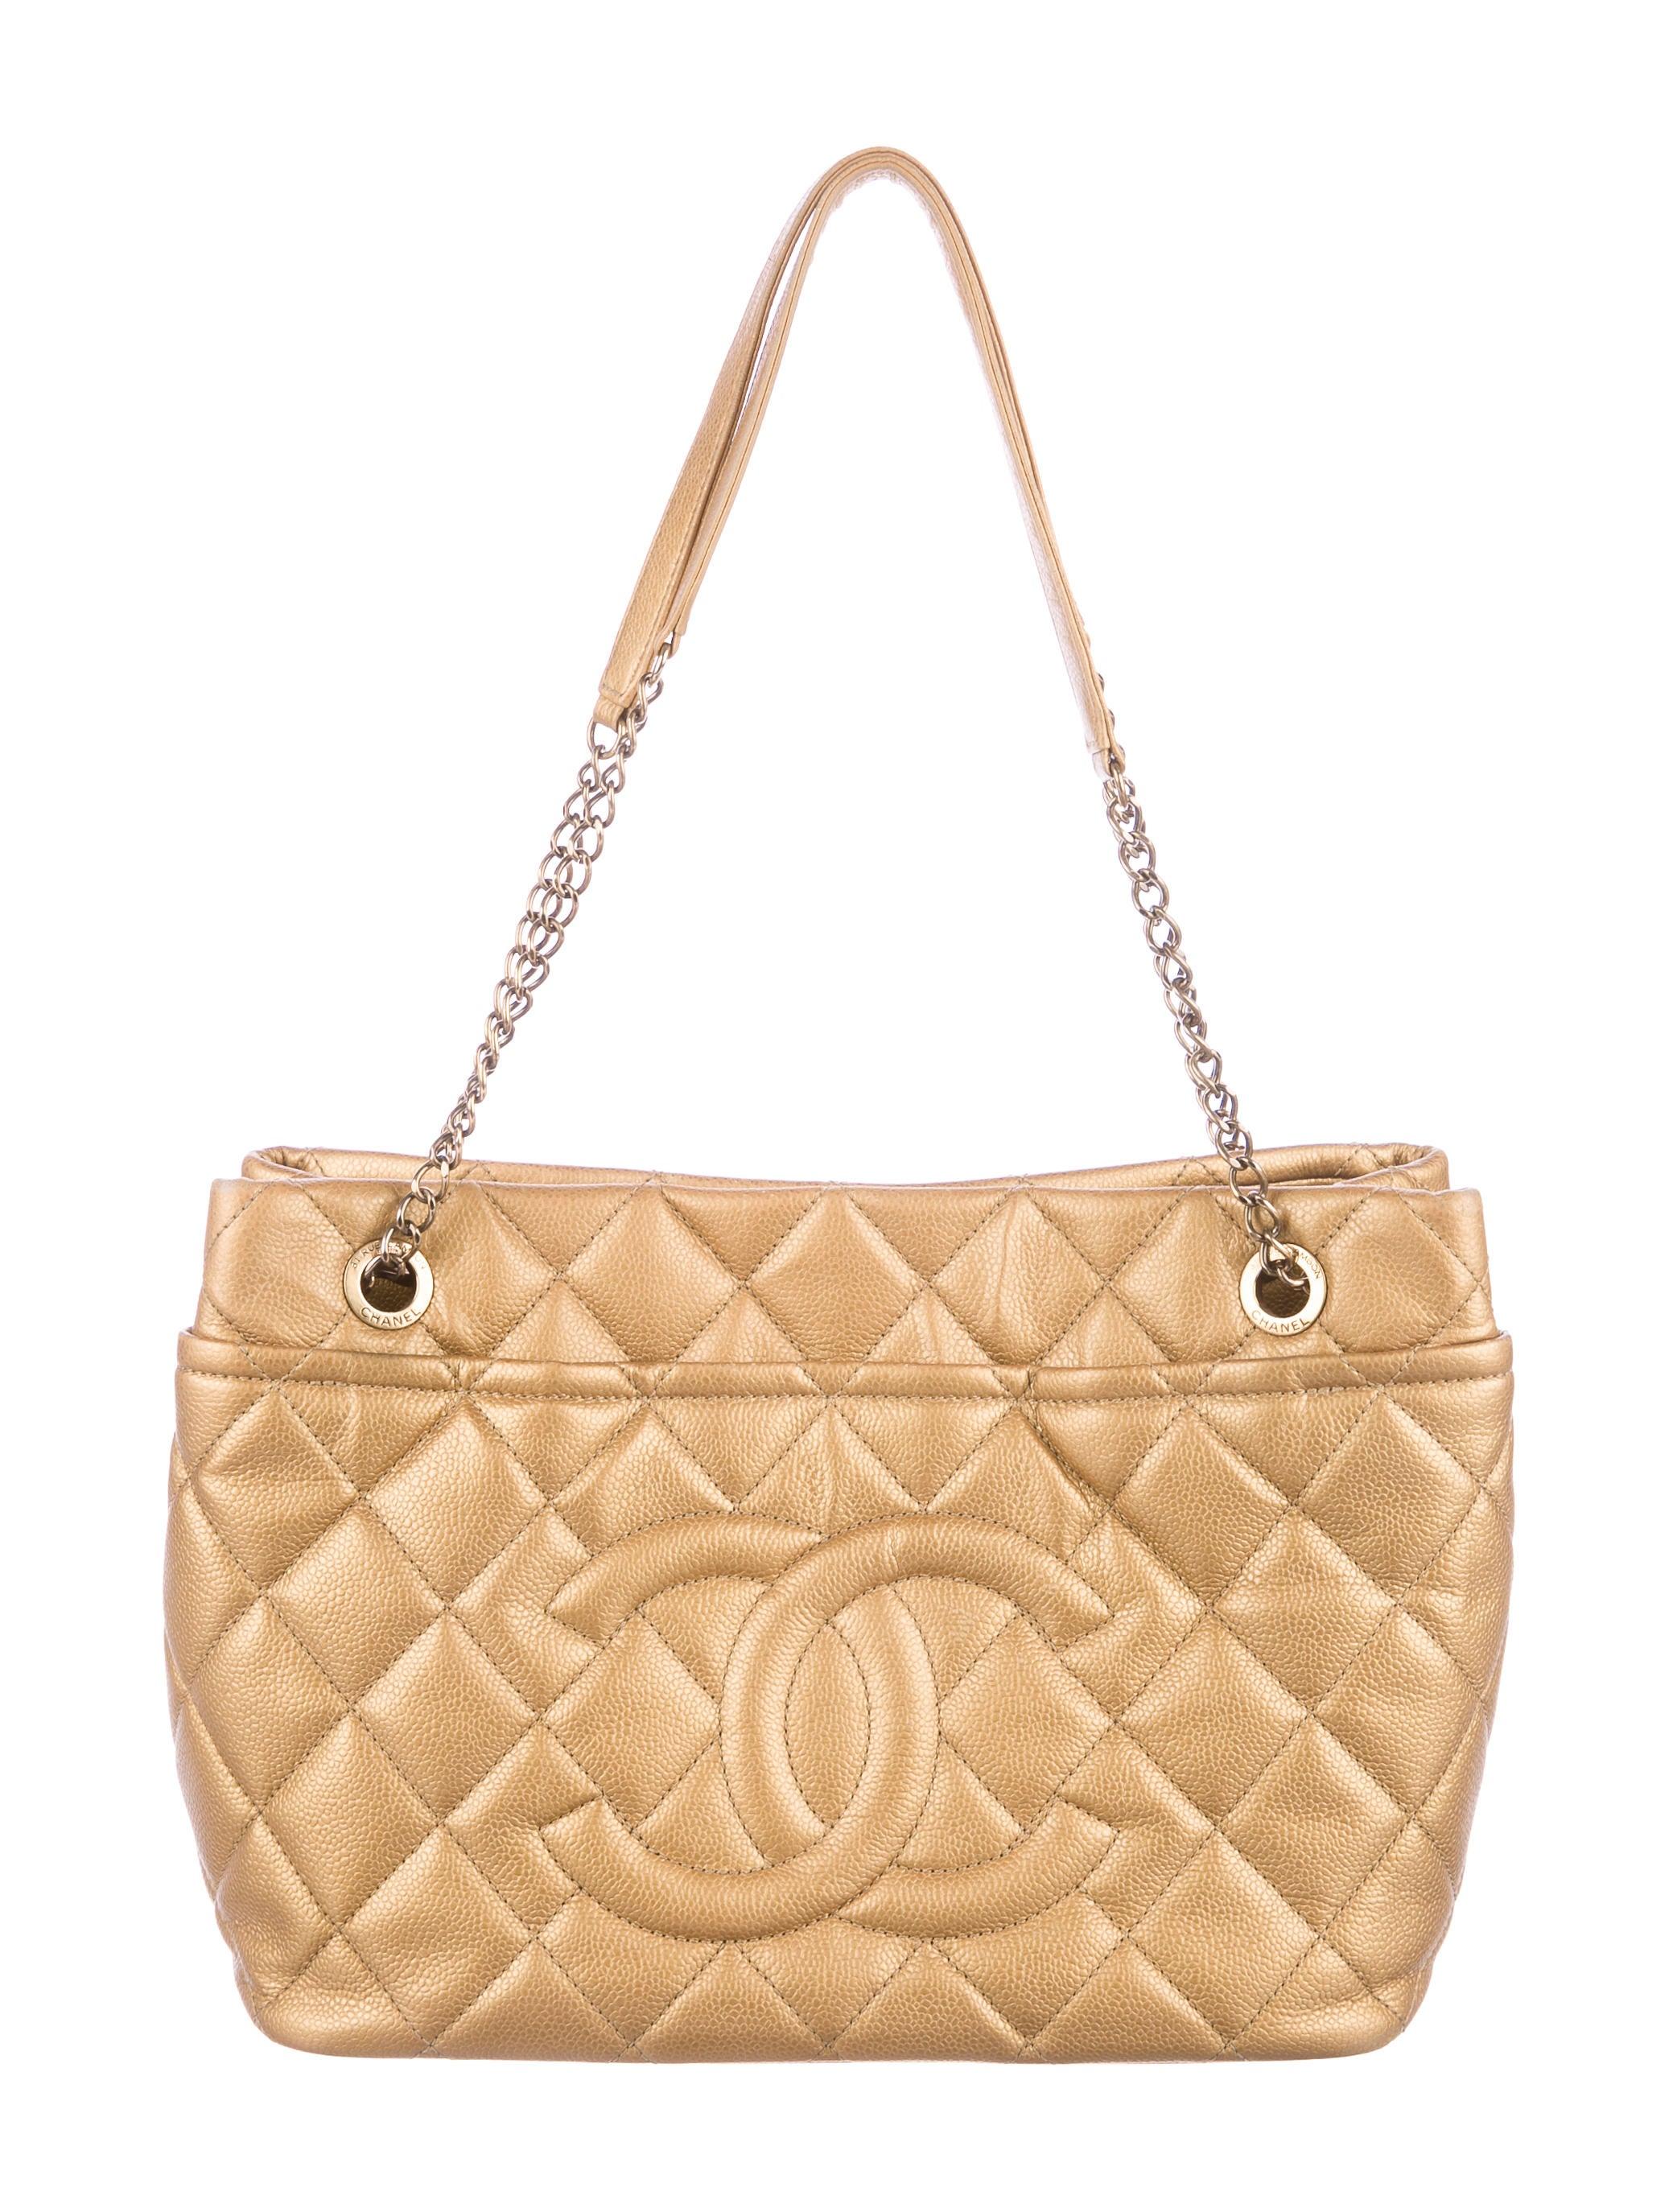 Chanel Caviar Timeless Soft Shopper Tote - Handbags - CHA221918 ... 5ca84130d8dac